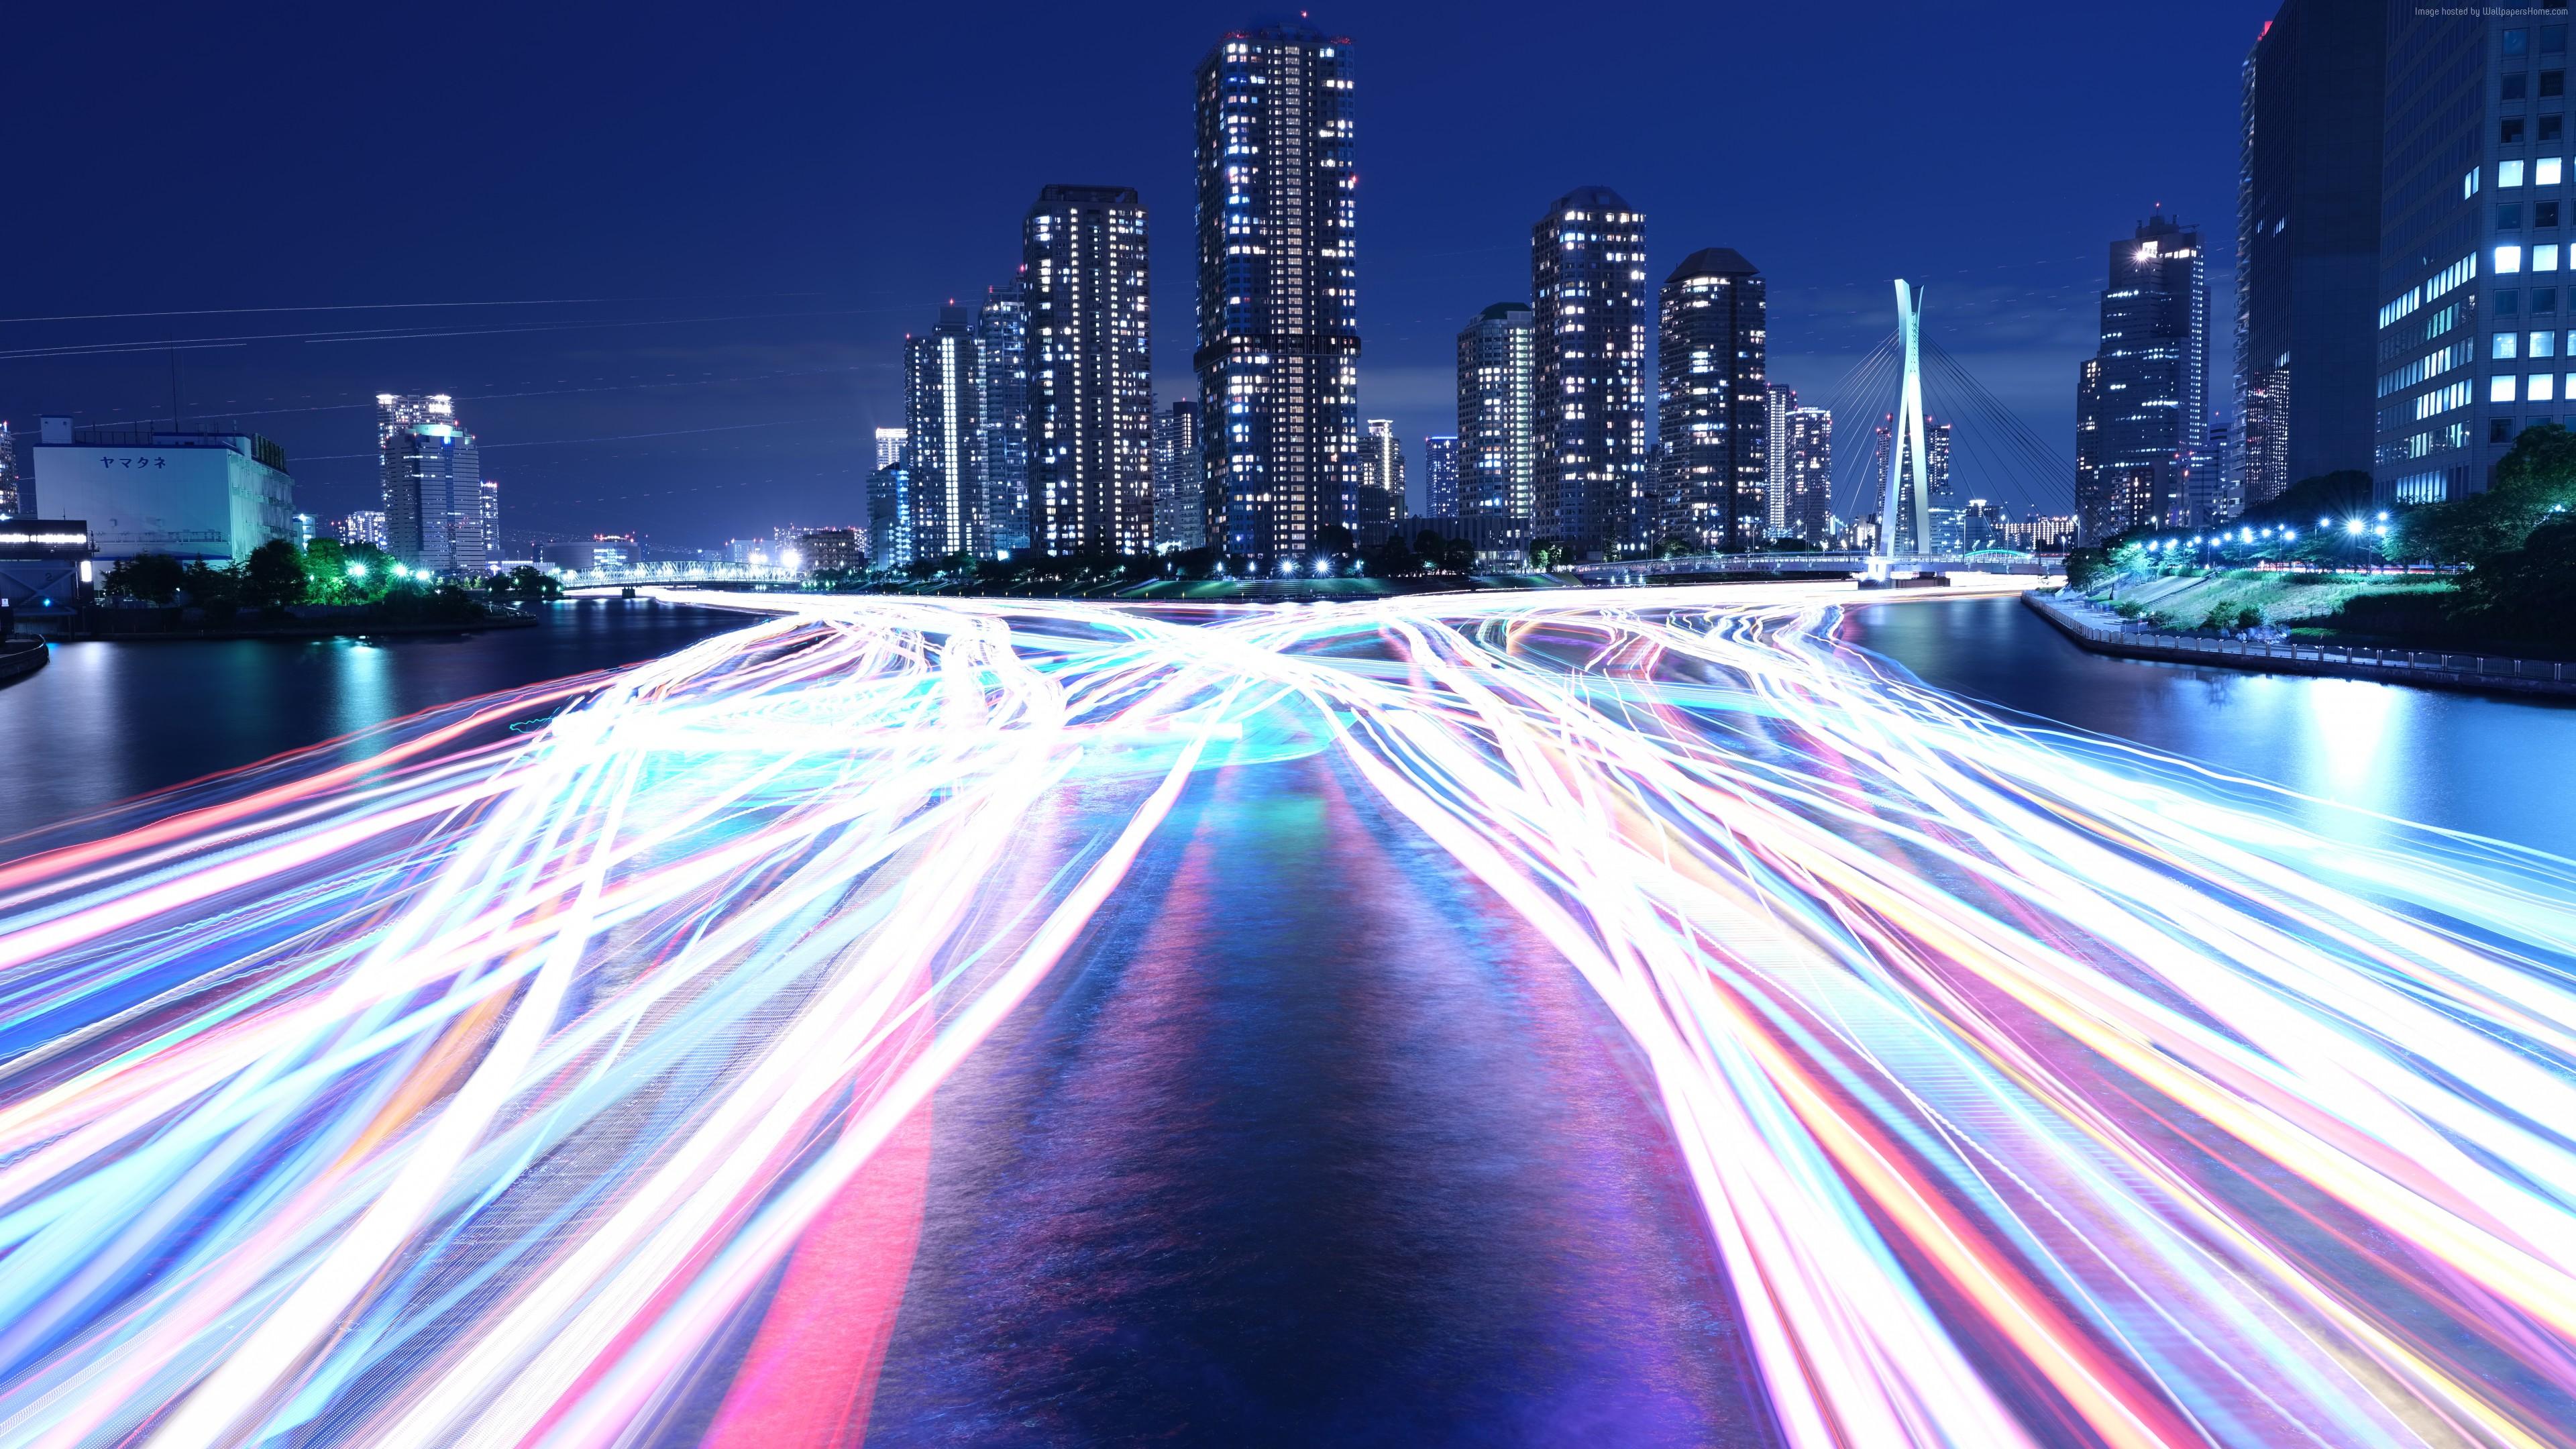 Wallpaper City Light Night River 4K 8K Architecture 4k 8k Download